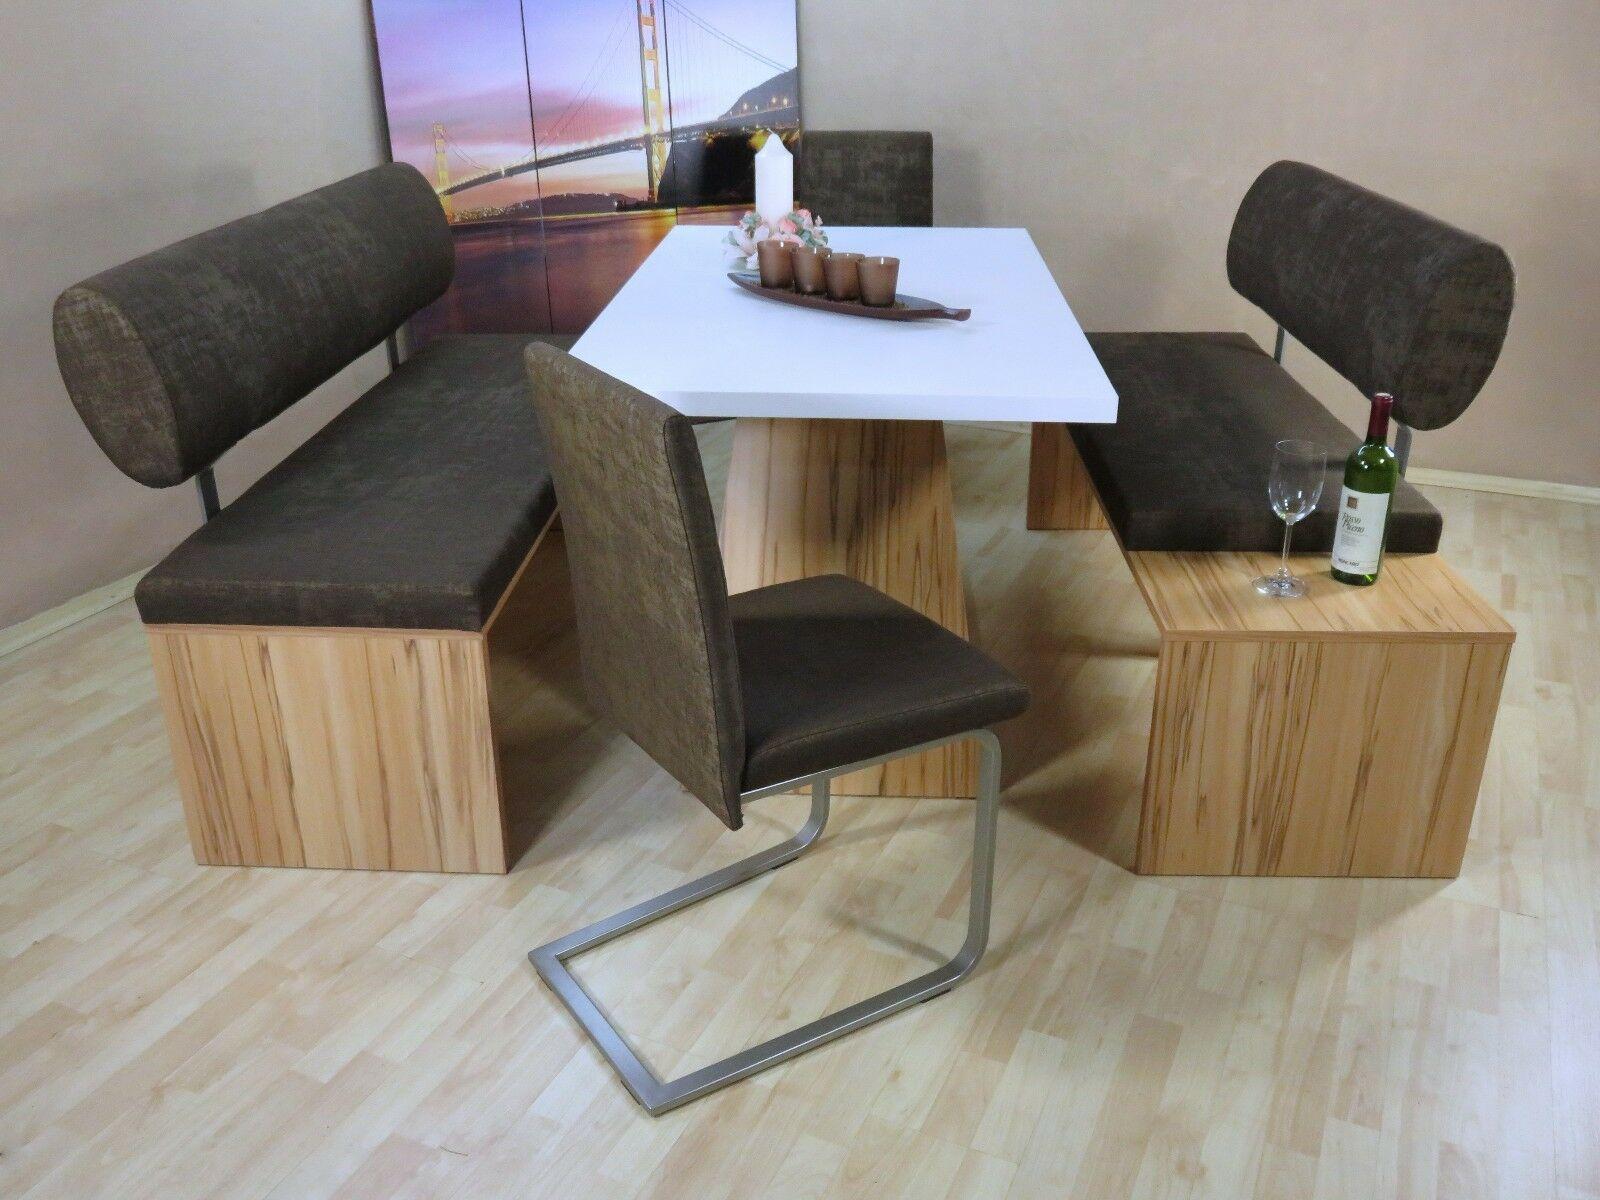 Stühle schoko Essgruppe 2 Sitzbank Dinninggruppe Bänke Eckbankgruppe Kernbuche x RqA54jL3